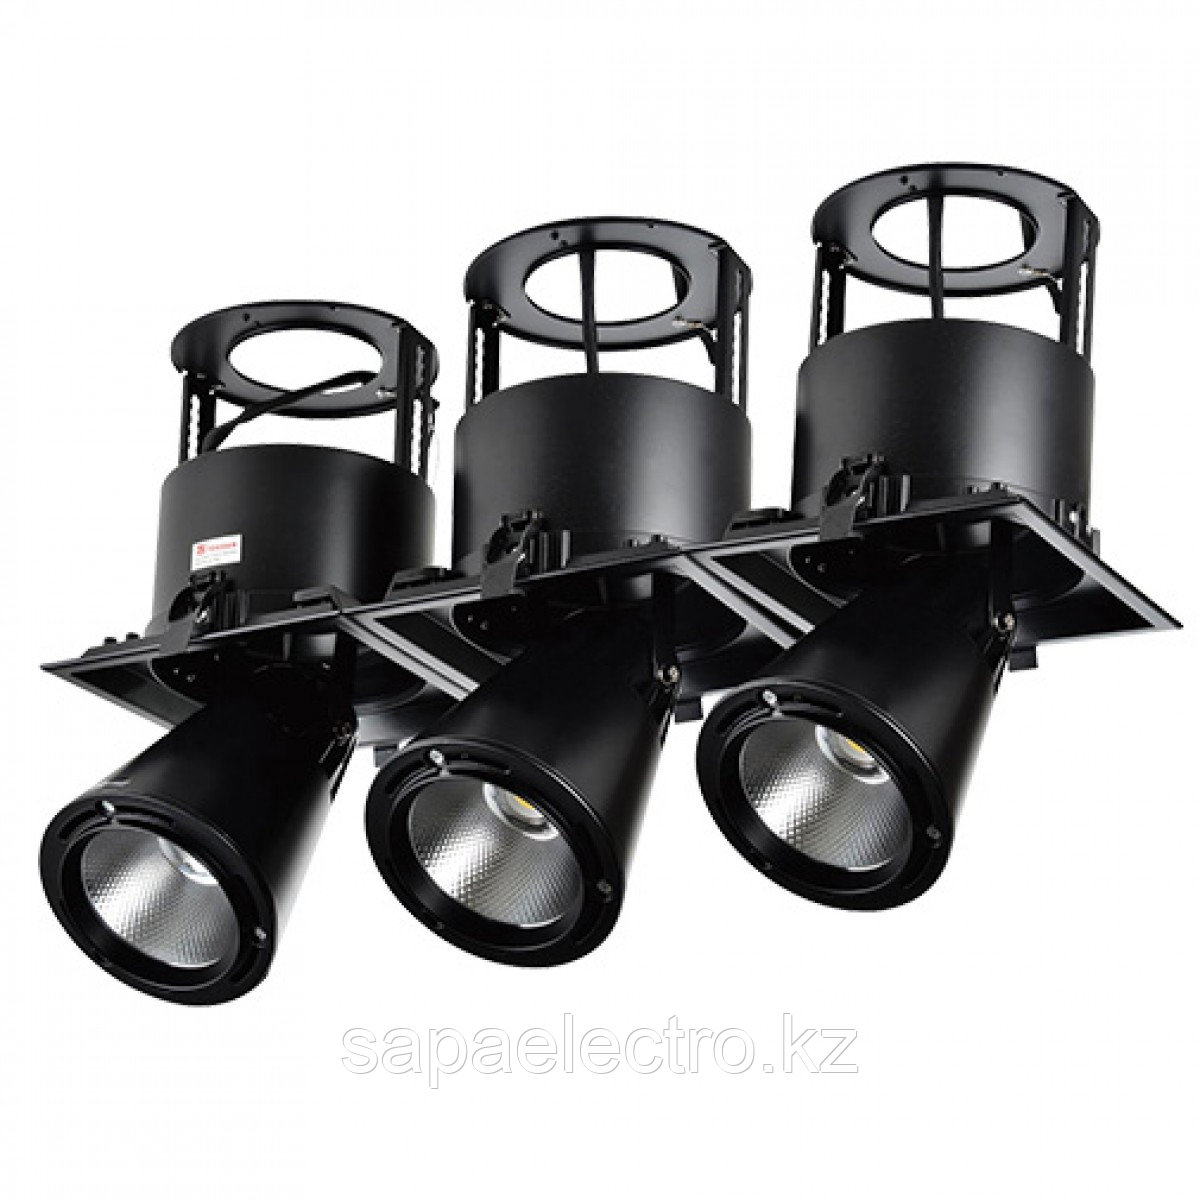 Св-к DOWNLIGHT LED LS-DK911-3 3X40W 5700K BLACK(TS)